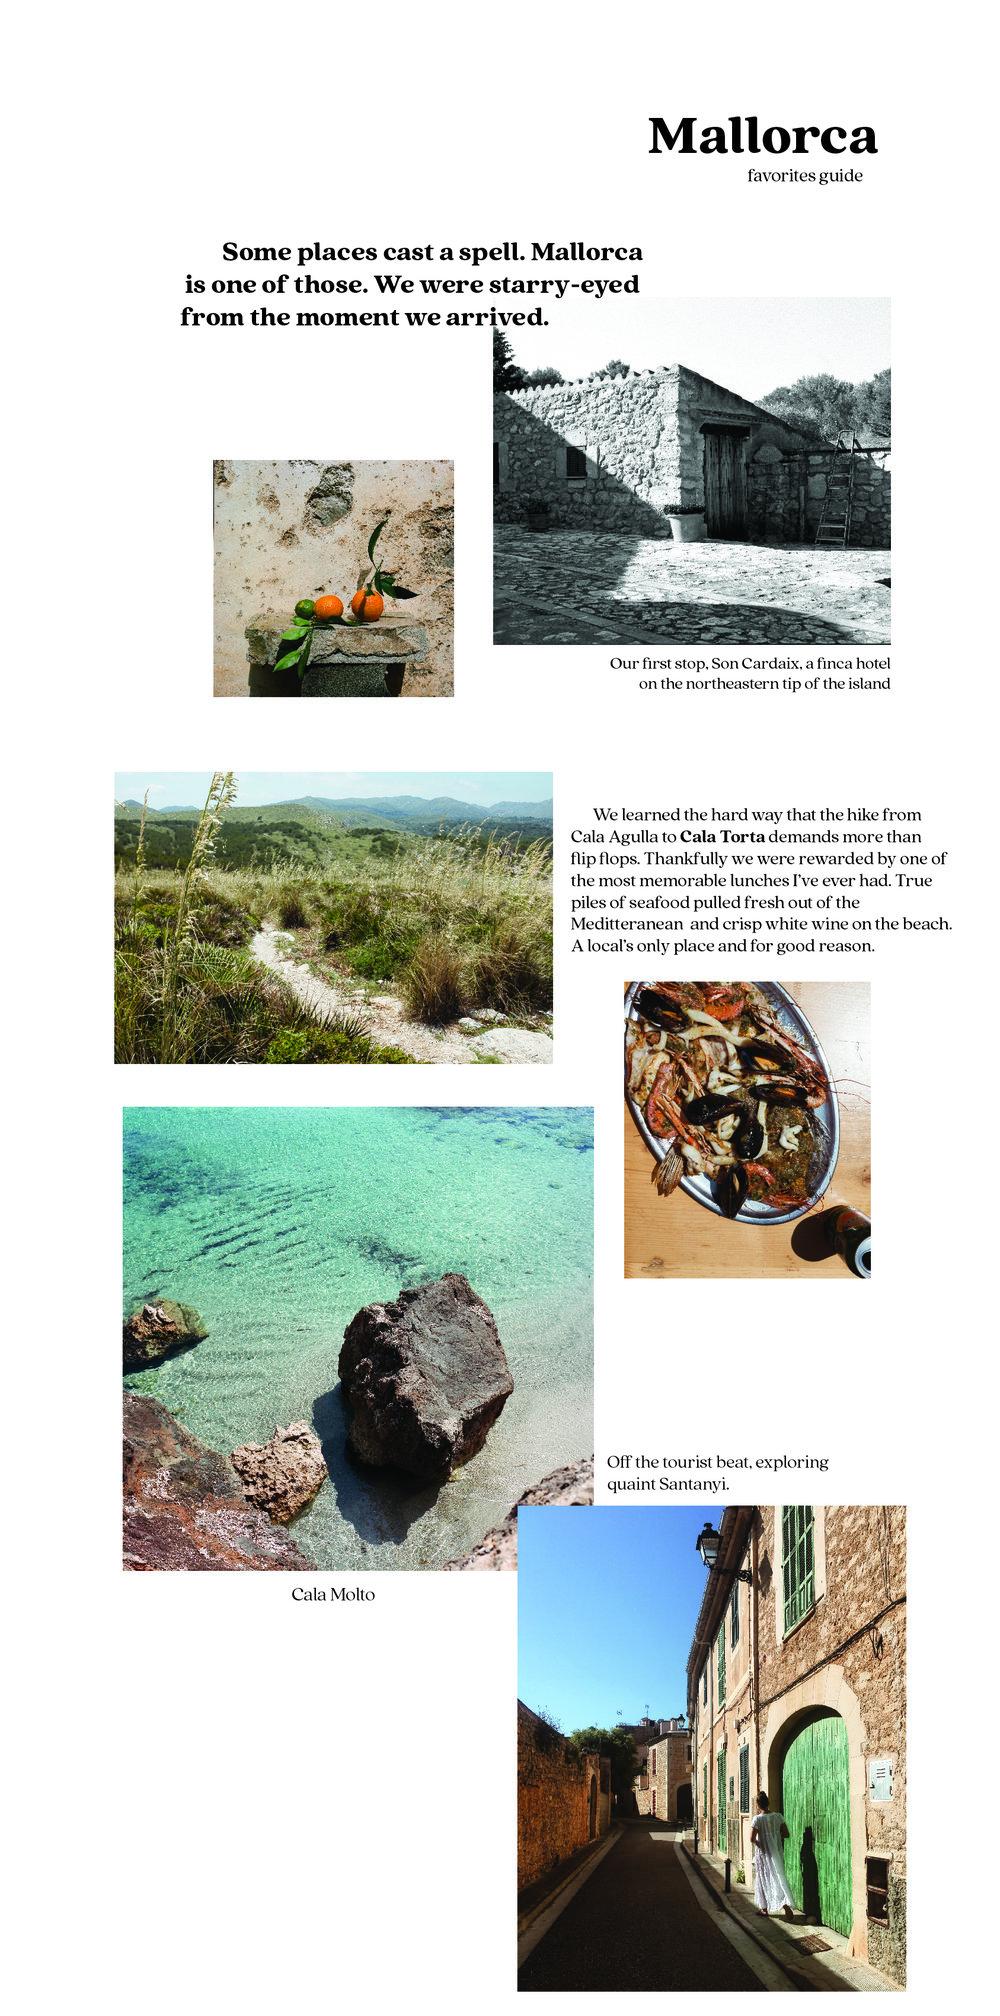 Mallorca itinerary, pt 1. -01.jpg